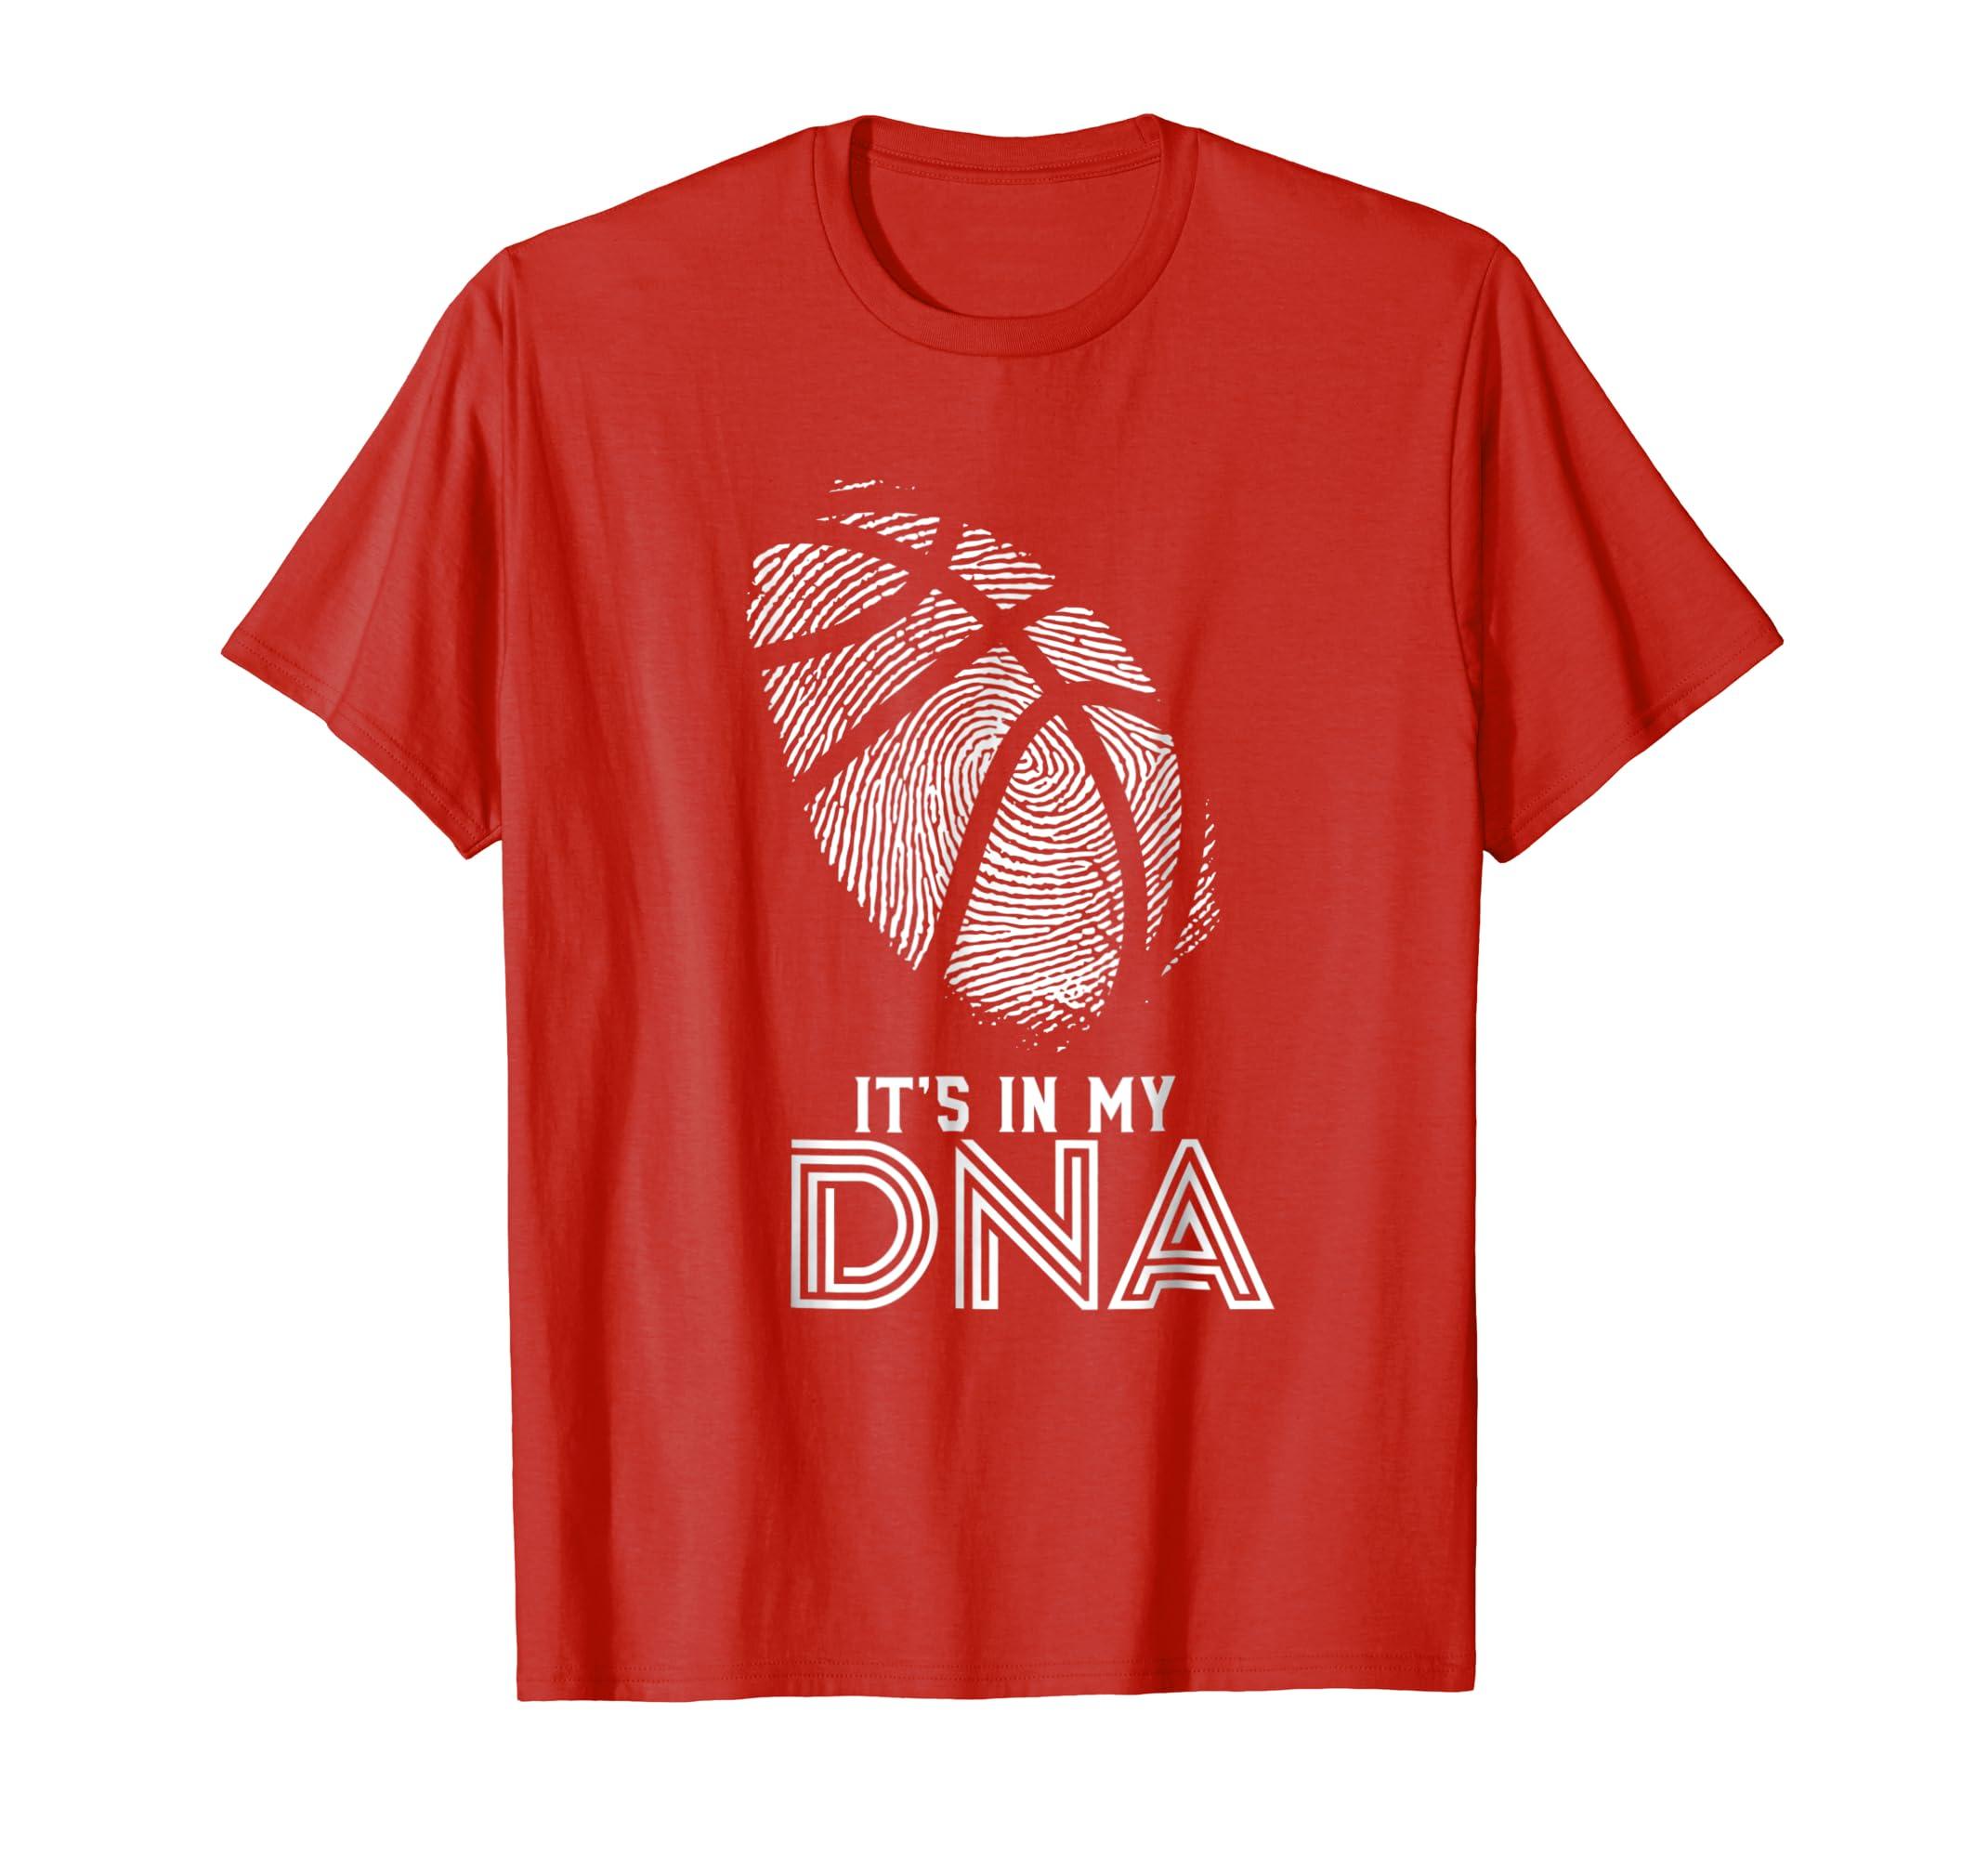 Basketball is My Love T-shirt for Men Women Teens- TPT